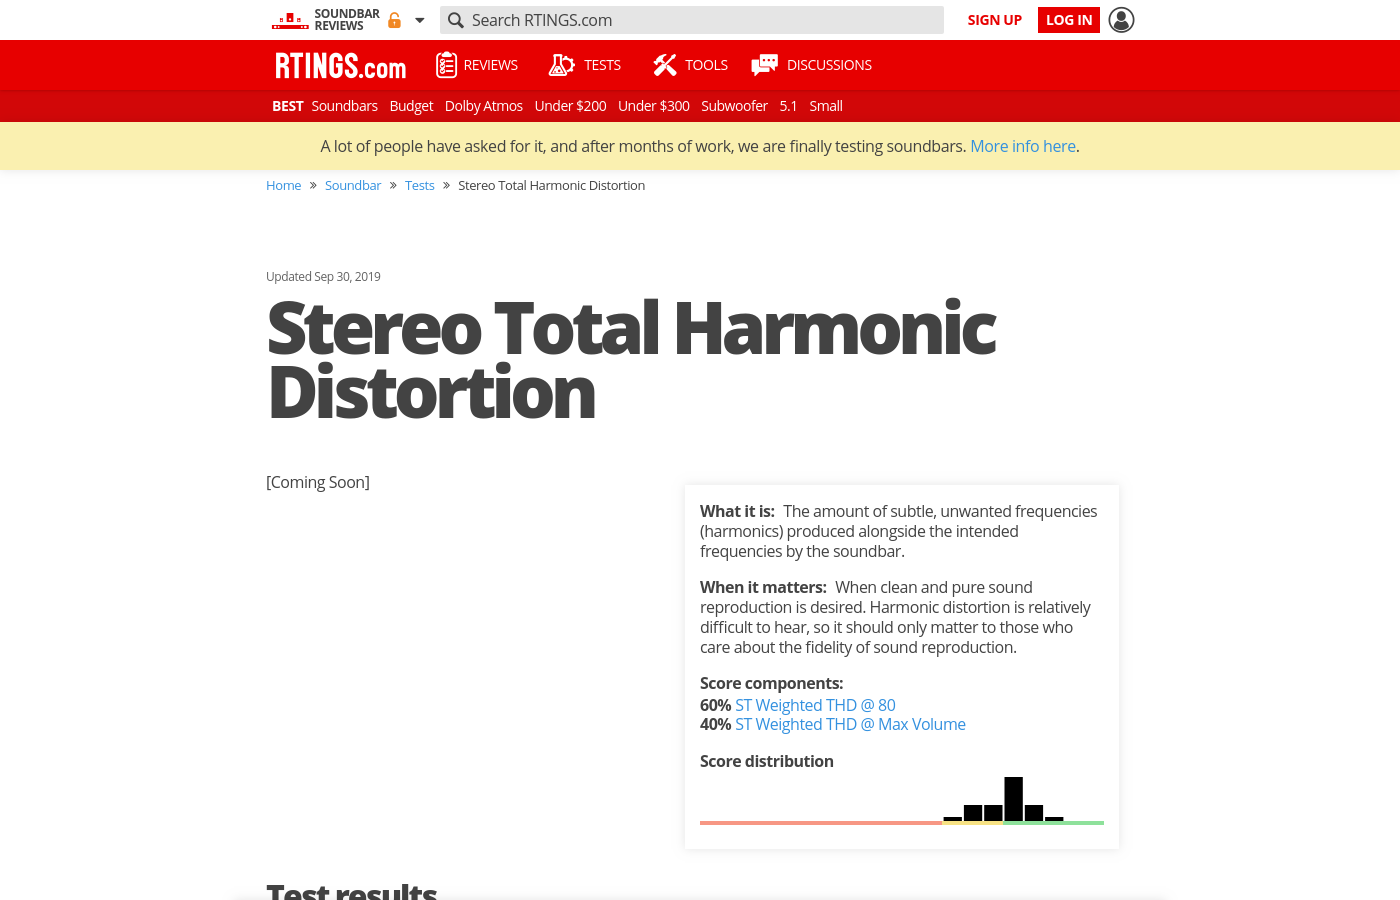 Stereo Total Harmonic Distortion